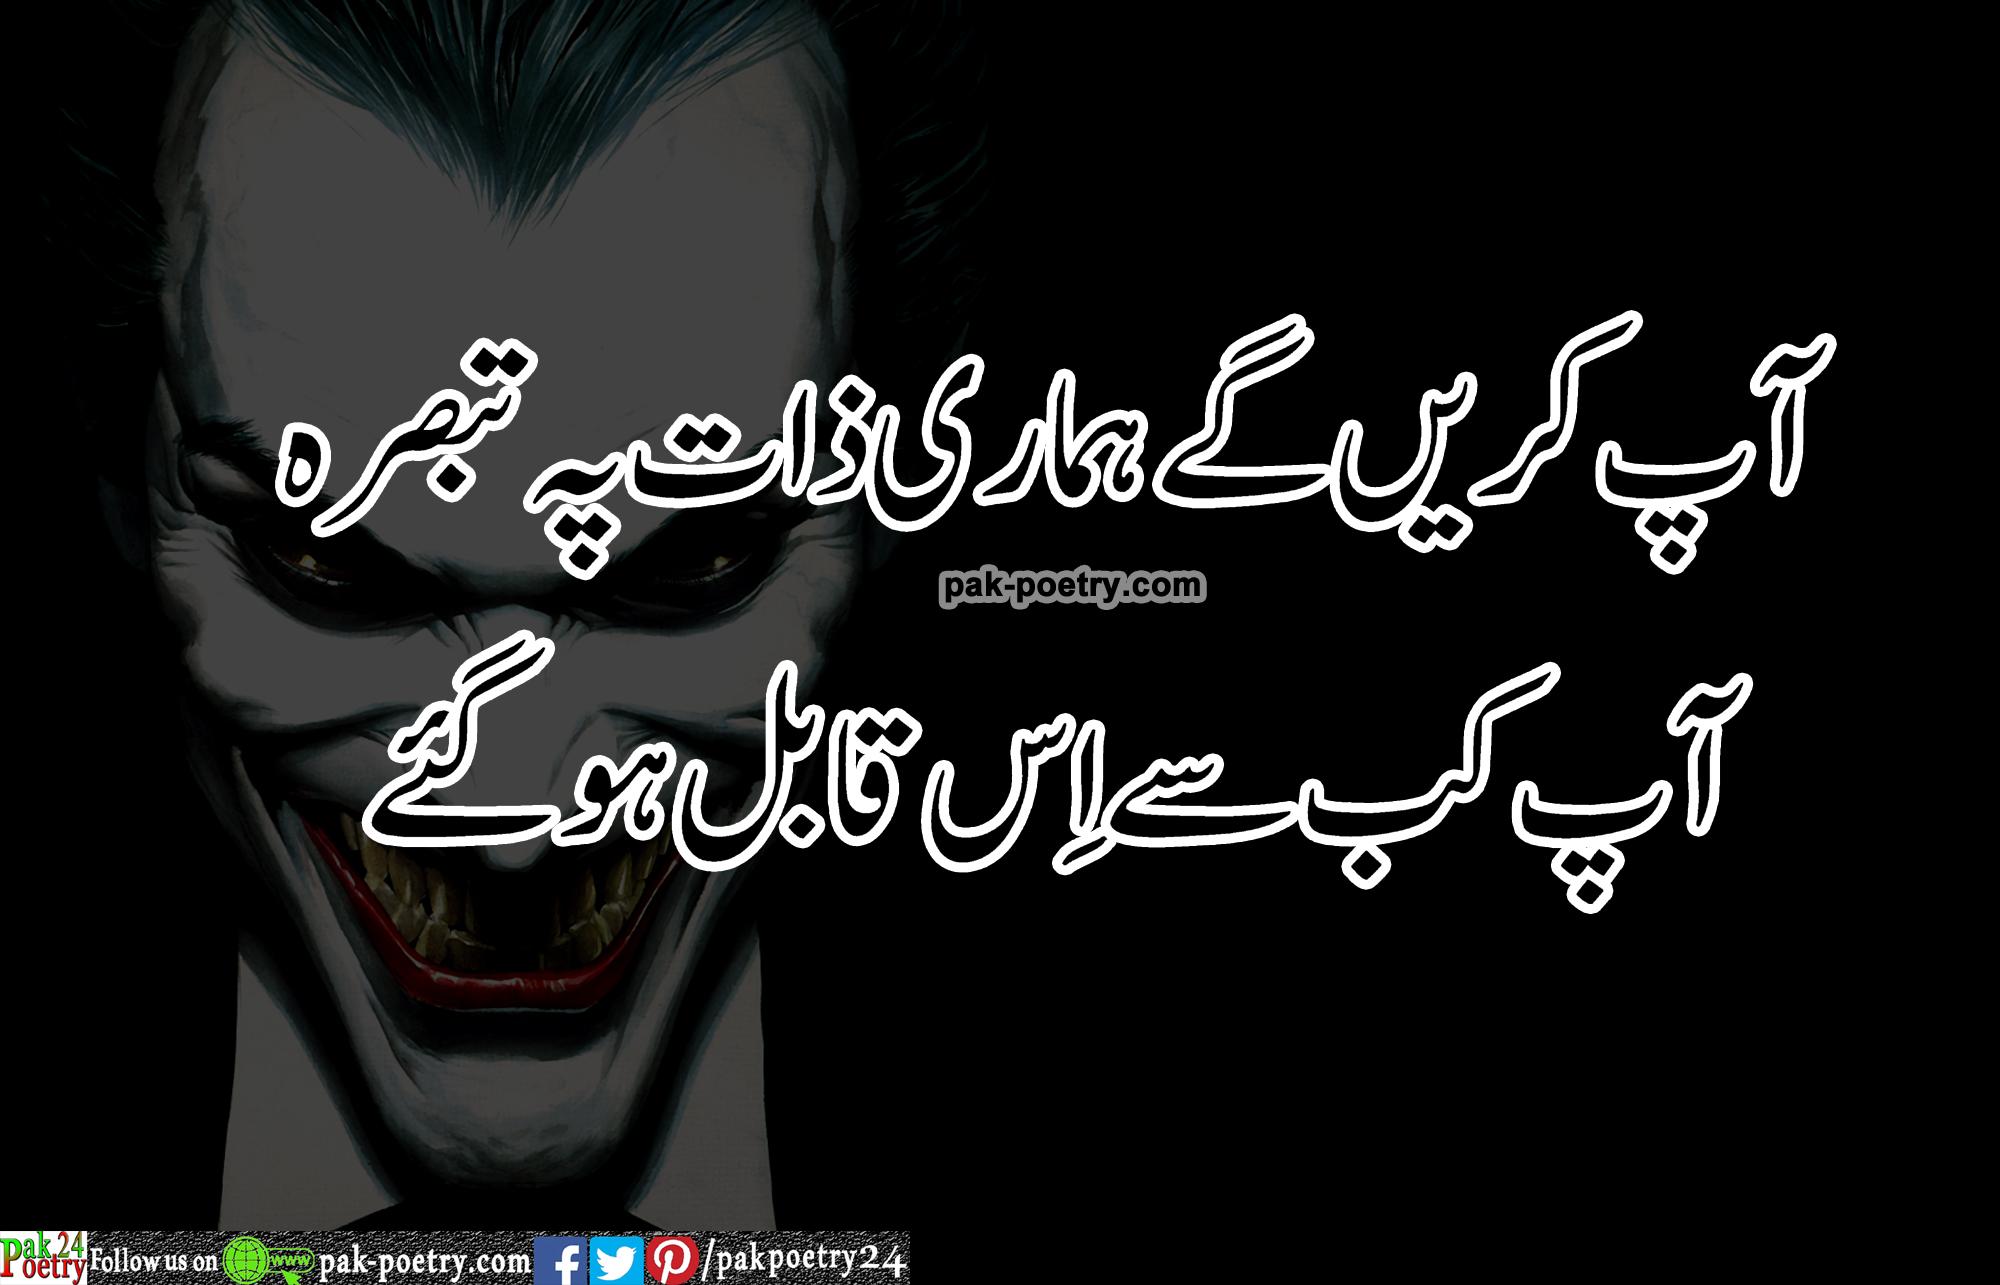 Attitude poetry, attitude poetry in urdu, attitude urdu poetry, attitude poetry urdu, attitude poetry images, poetry attitude, urdu attitude poetry, joker attitude, joker attitude images,